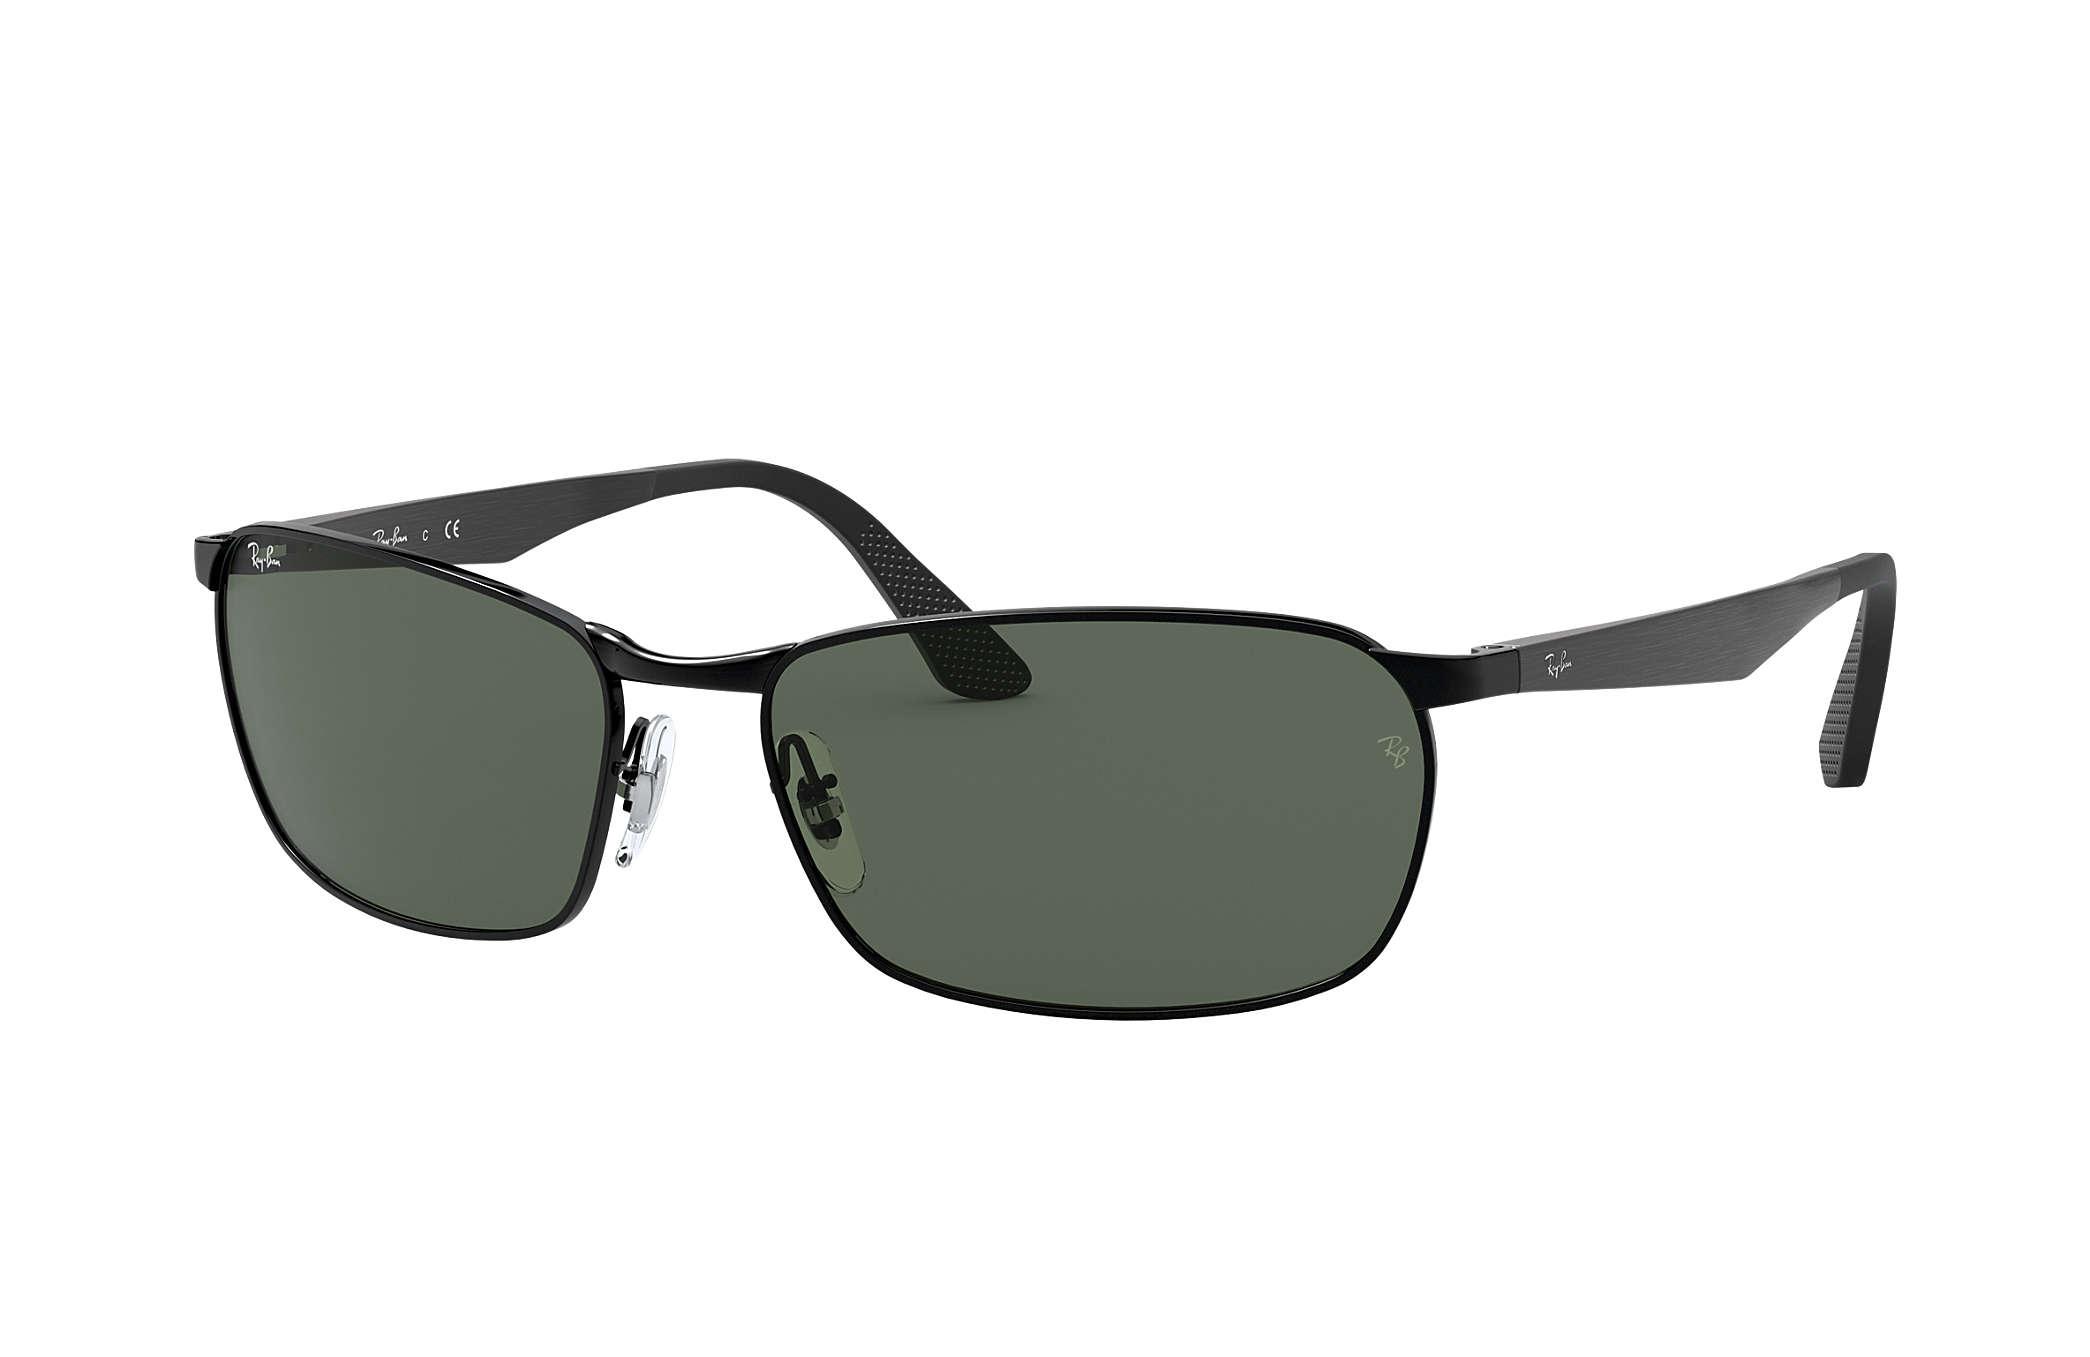 3e305edac0159 Ray-Ban RB3534 Black - Metal - Green Lenses - 0RB353400259